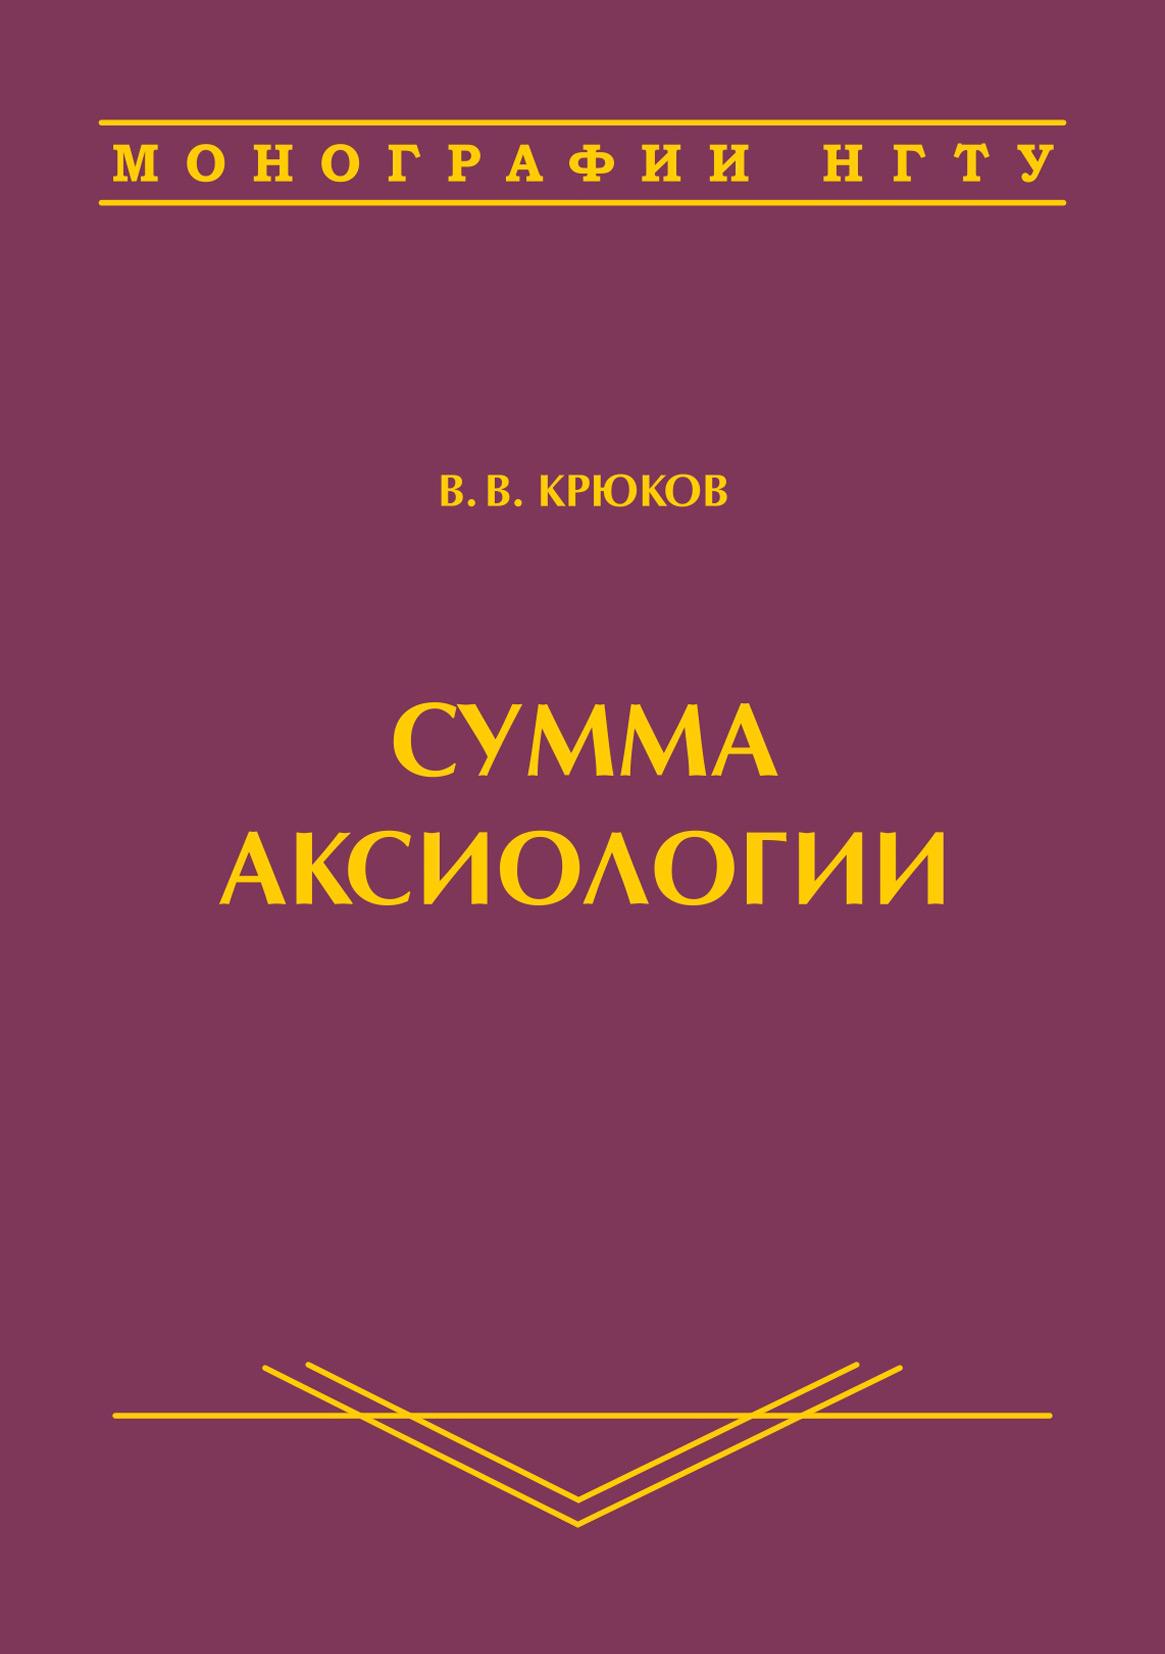 Виктор Васильевич Крюков Сумма аксиологии виктор васильевич крюков философия